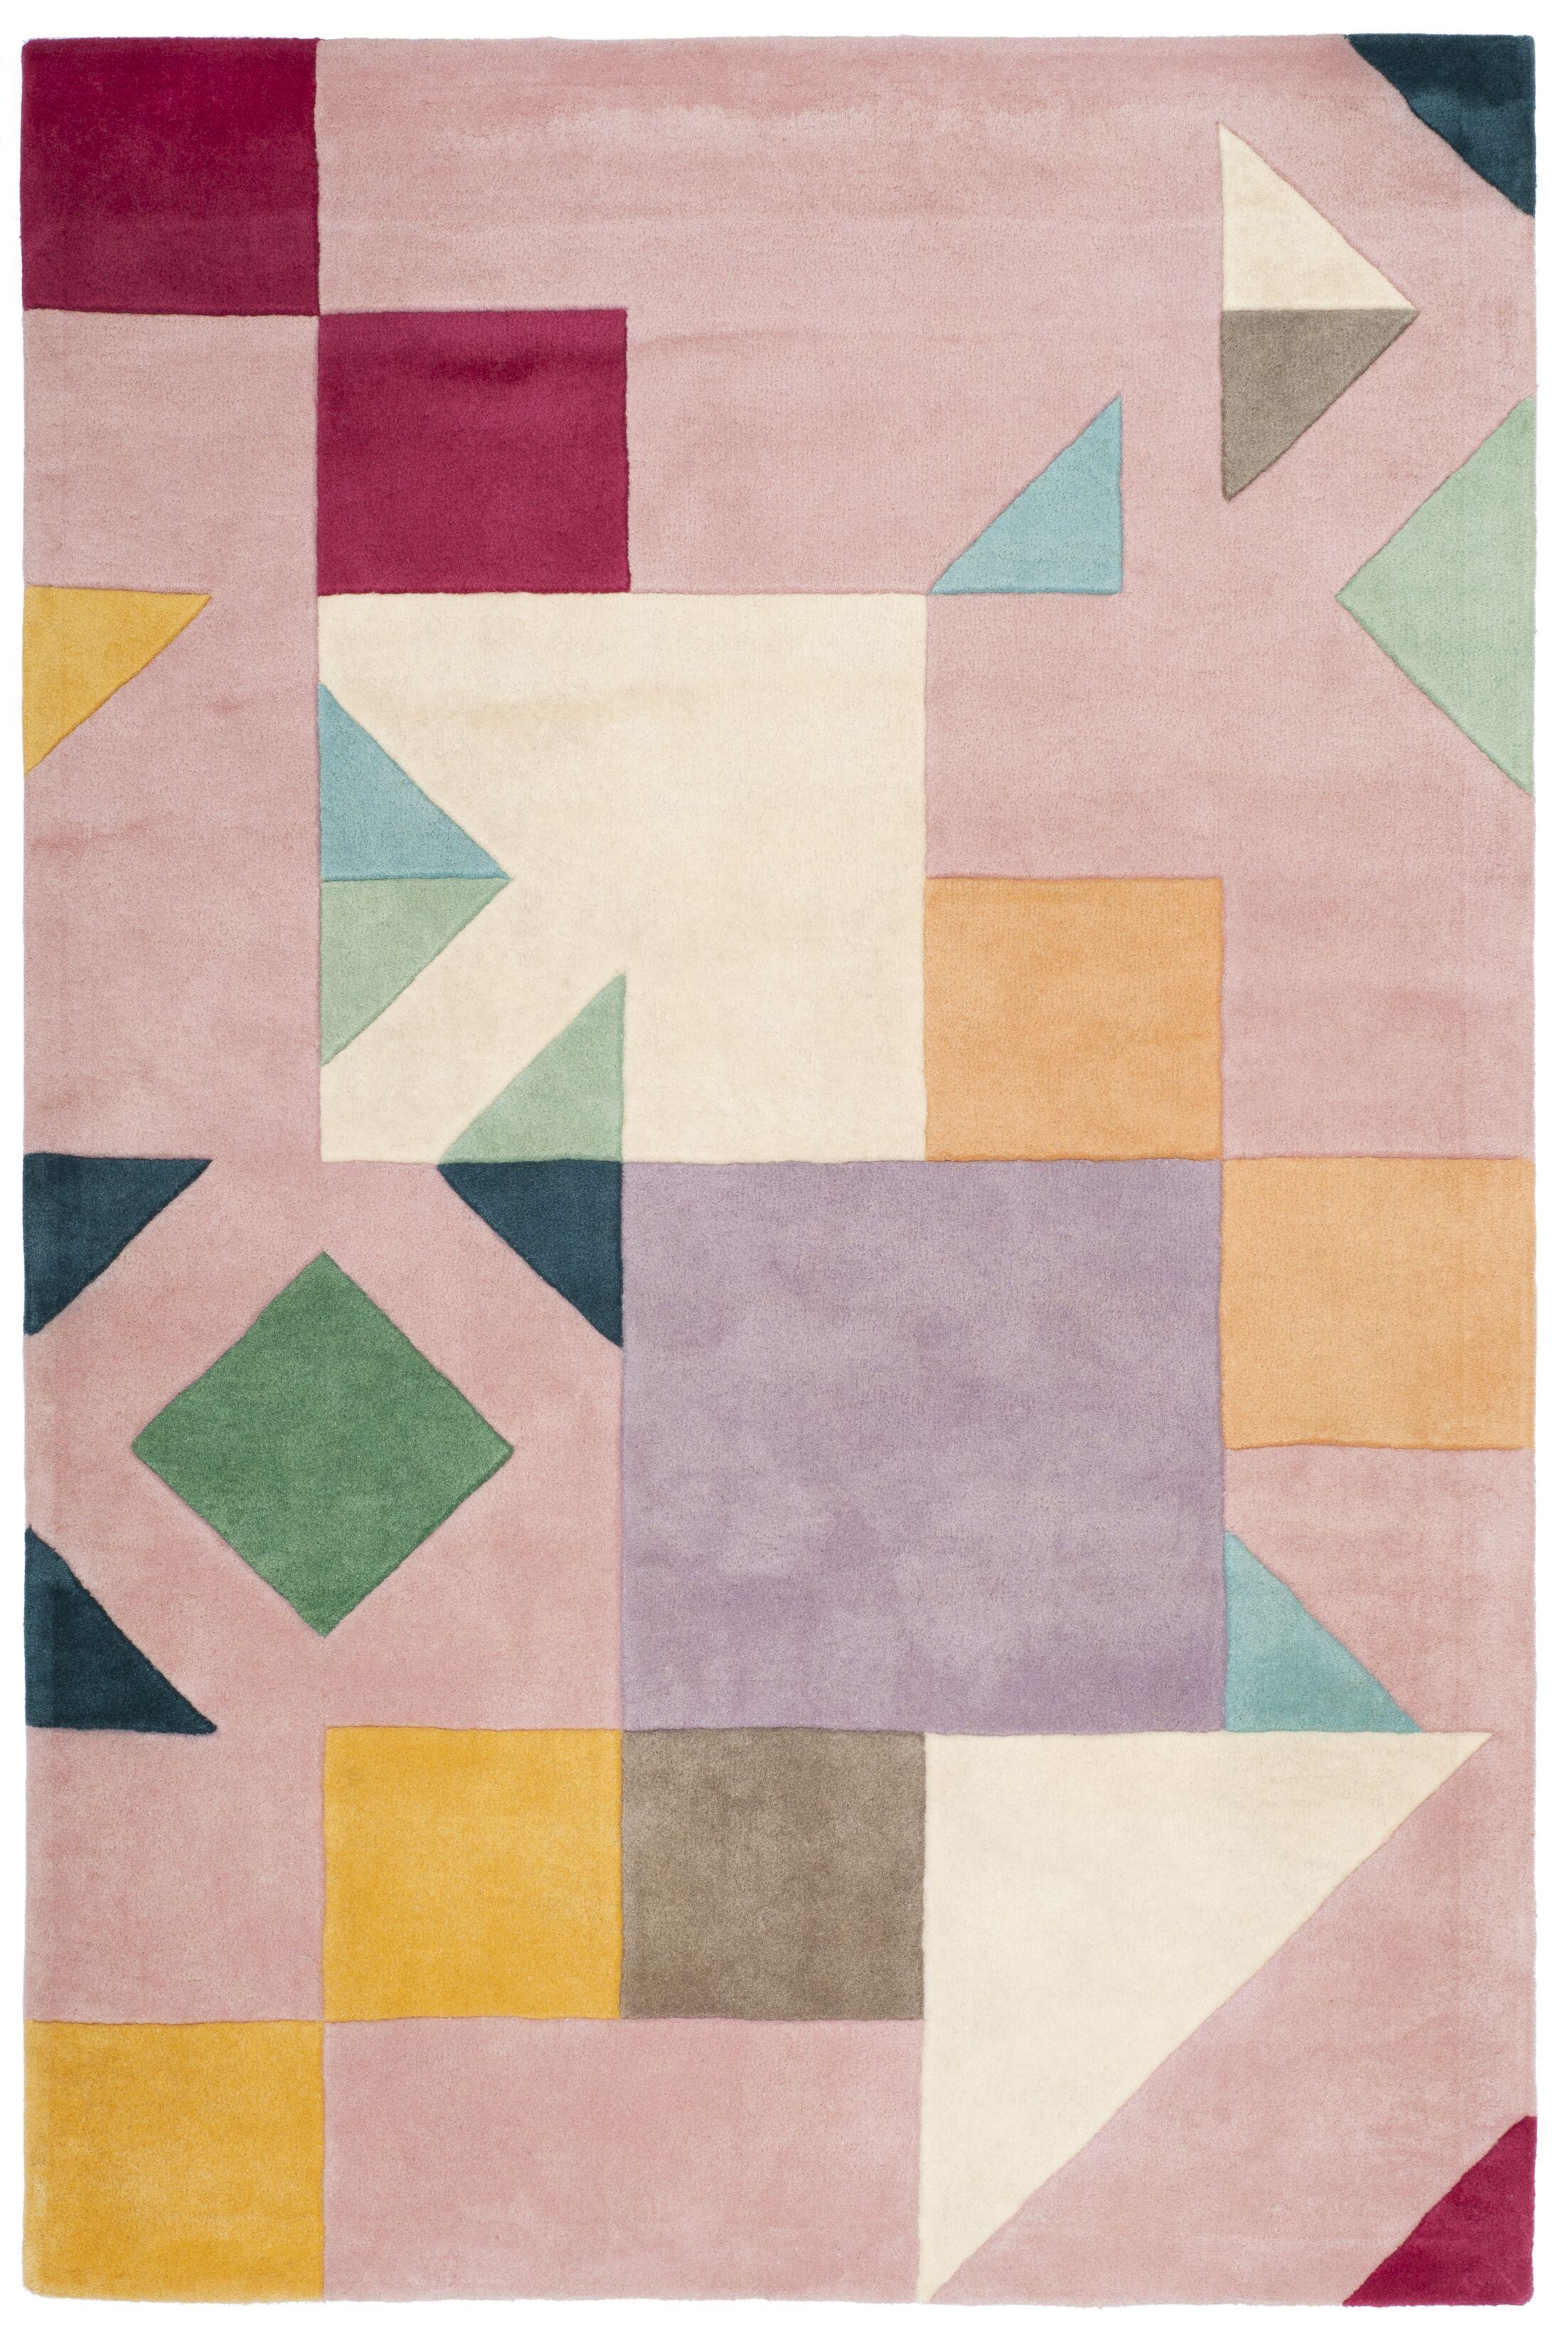 Carlberg Hand-Tufted Pink/Orange Area Rug Rug Size: Rectangle 4' x 6'